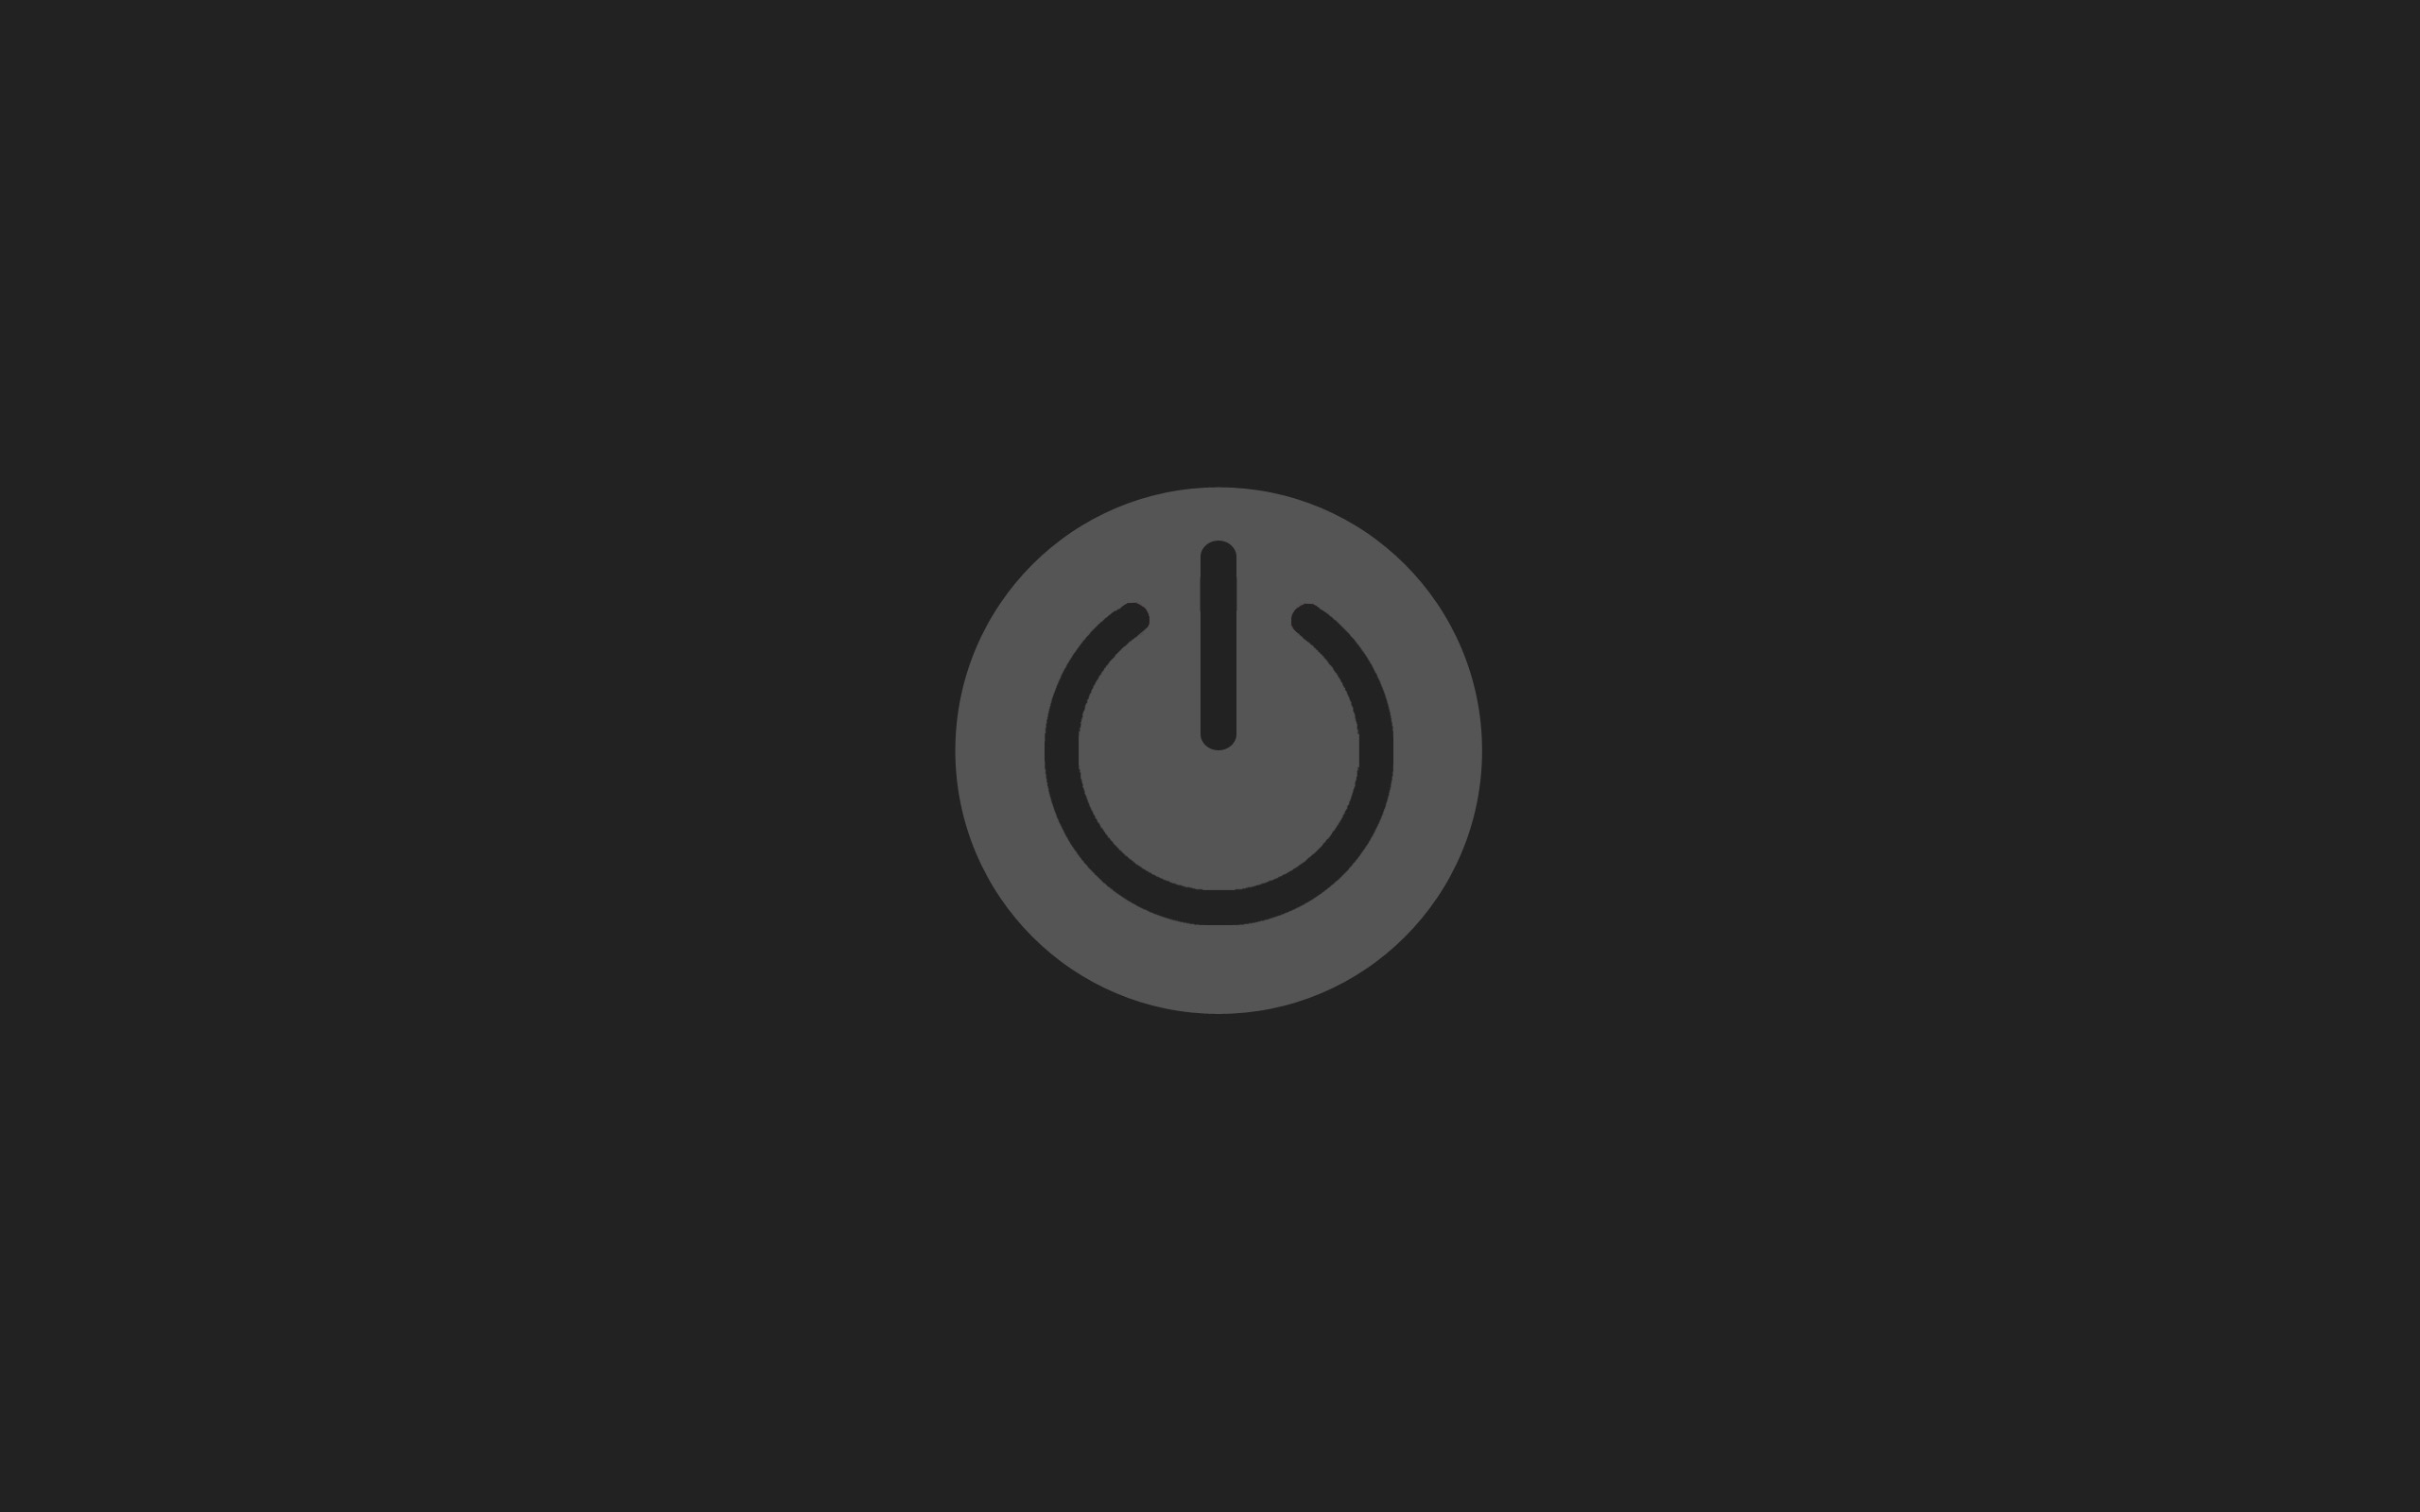 Central Wallpaper: Minimal <b>Power Button</b> Logos HD Wallpapers